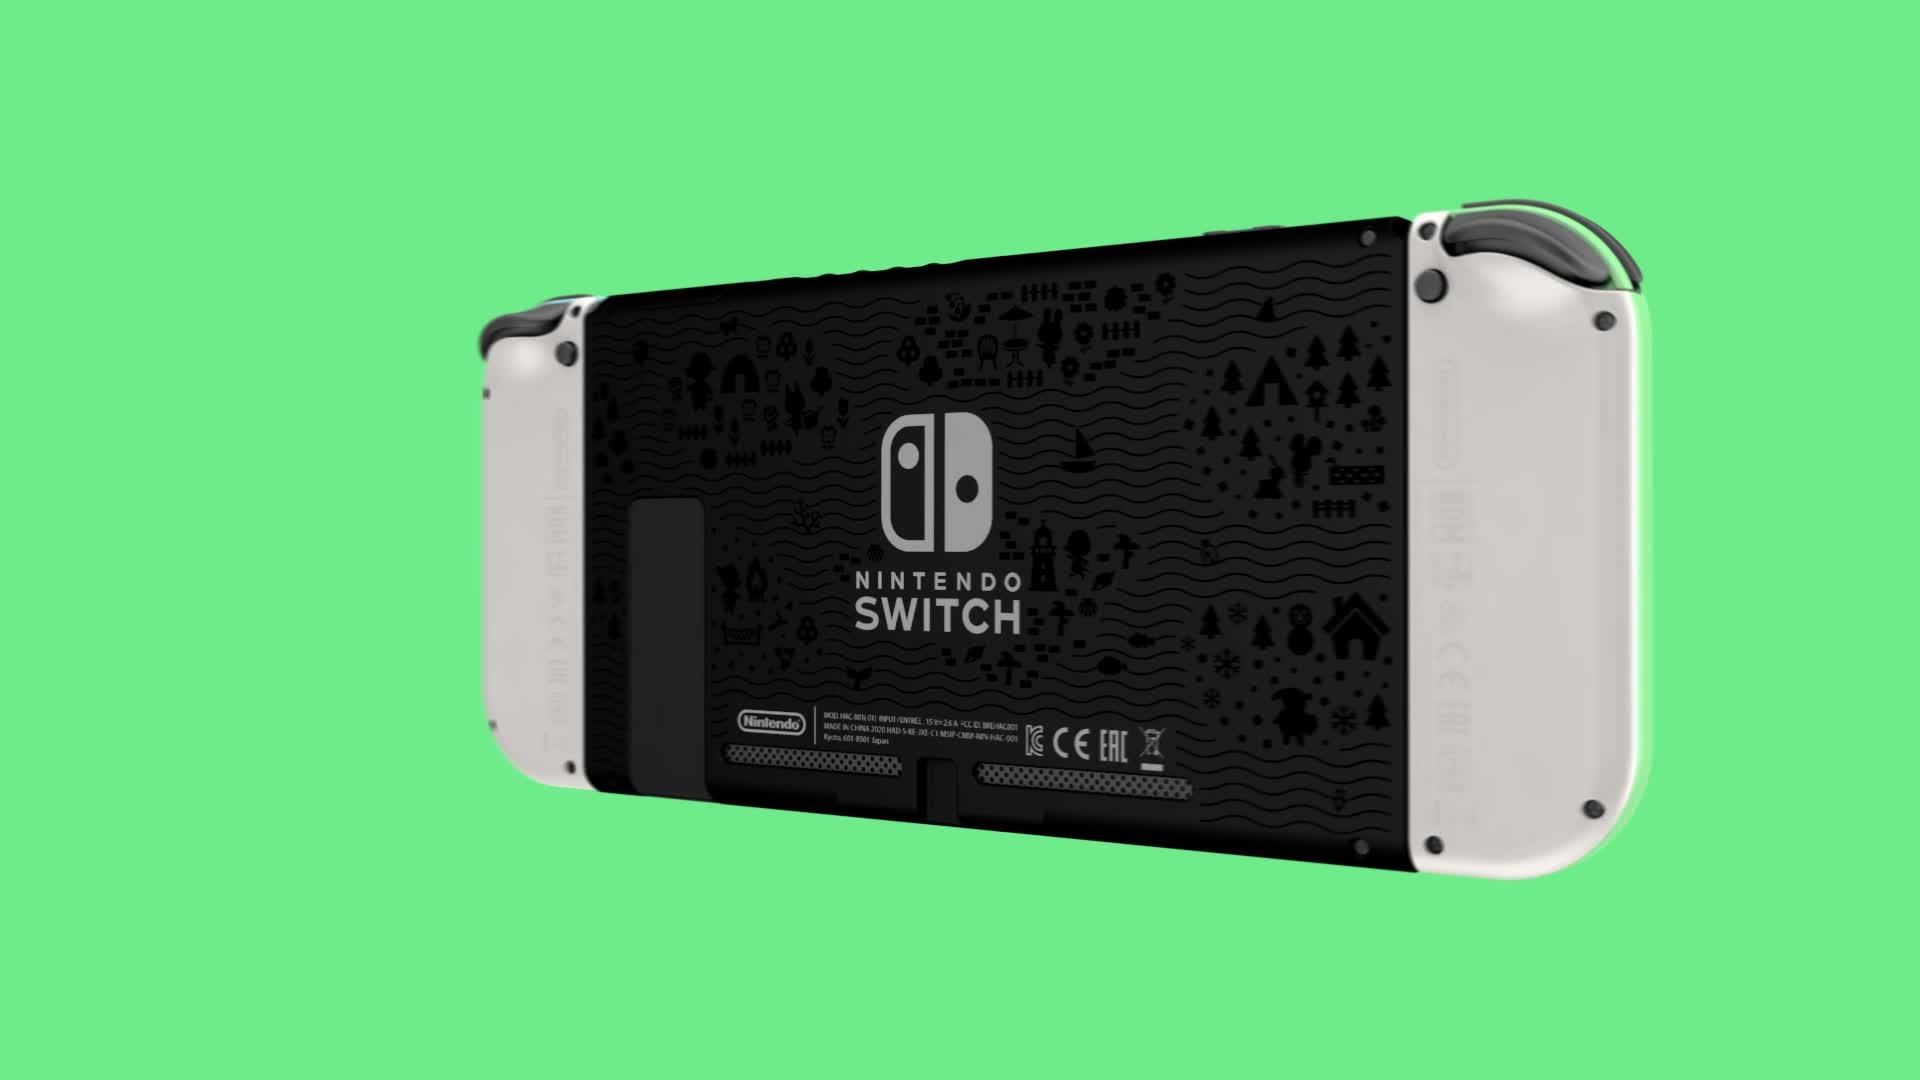 Nintendo Switch Animal Crossing New Horizons Edition Limited Edition Inkl Animal Crossing Downloadcode Games